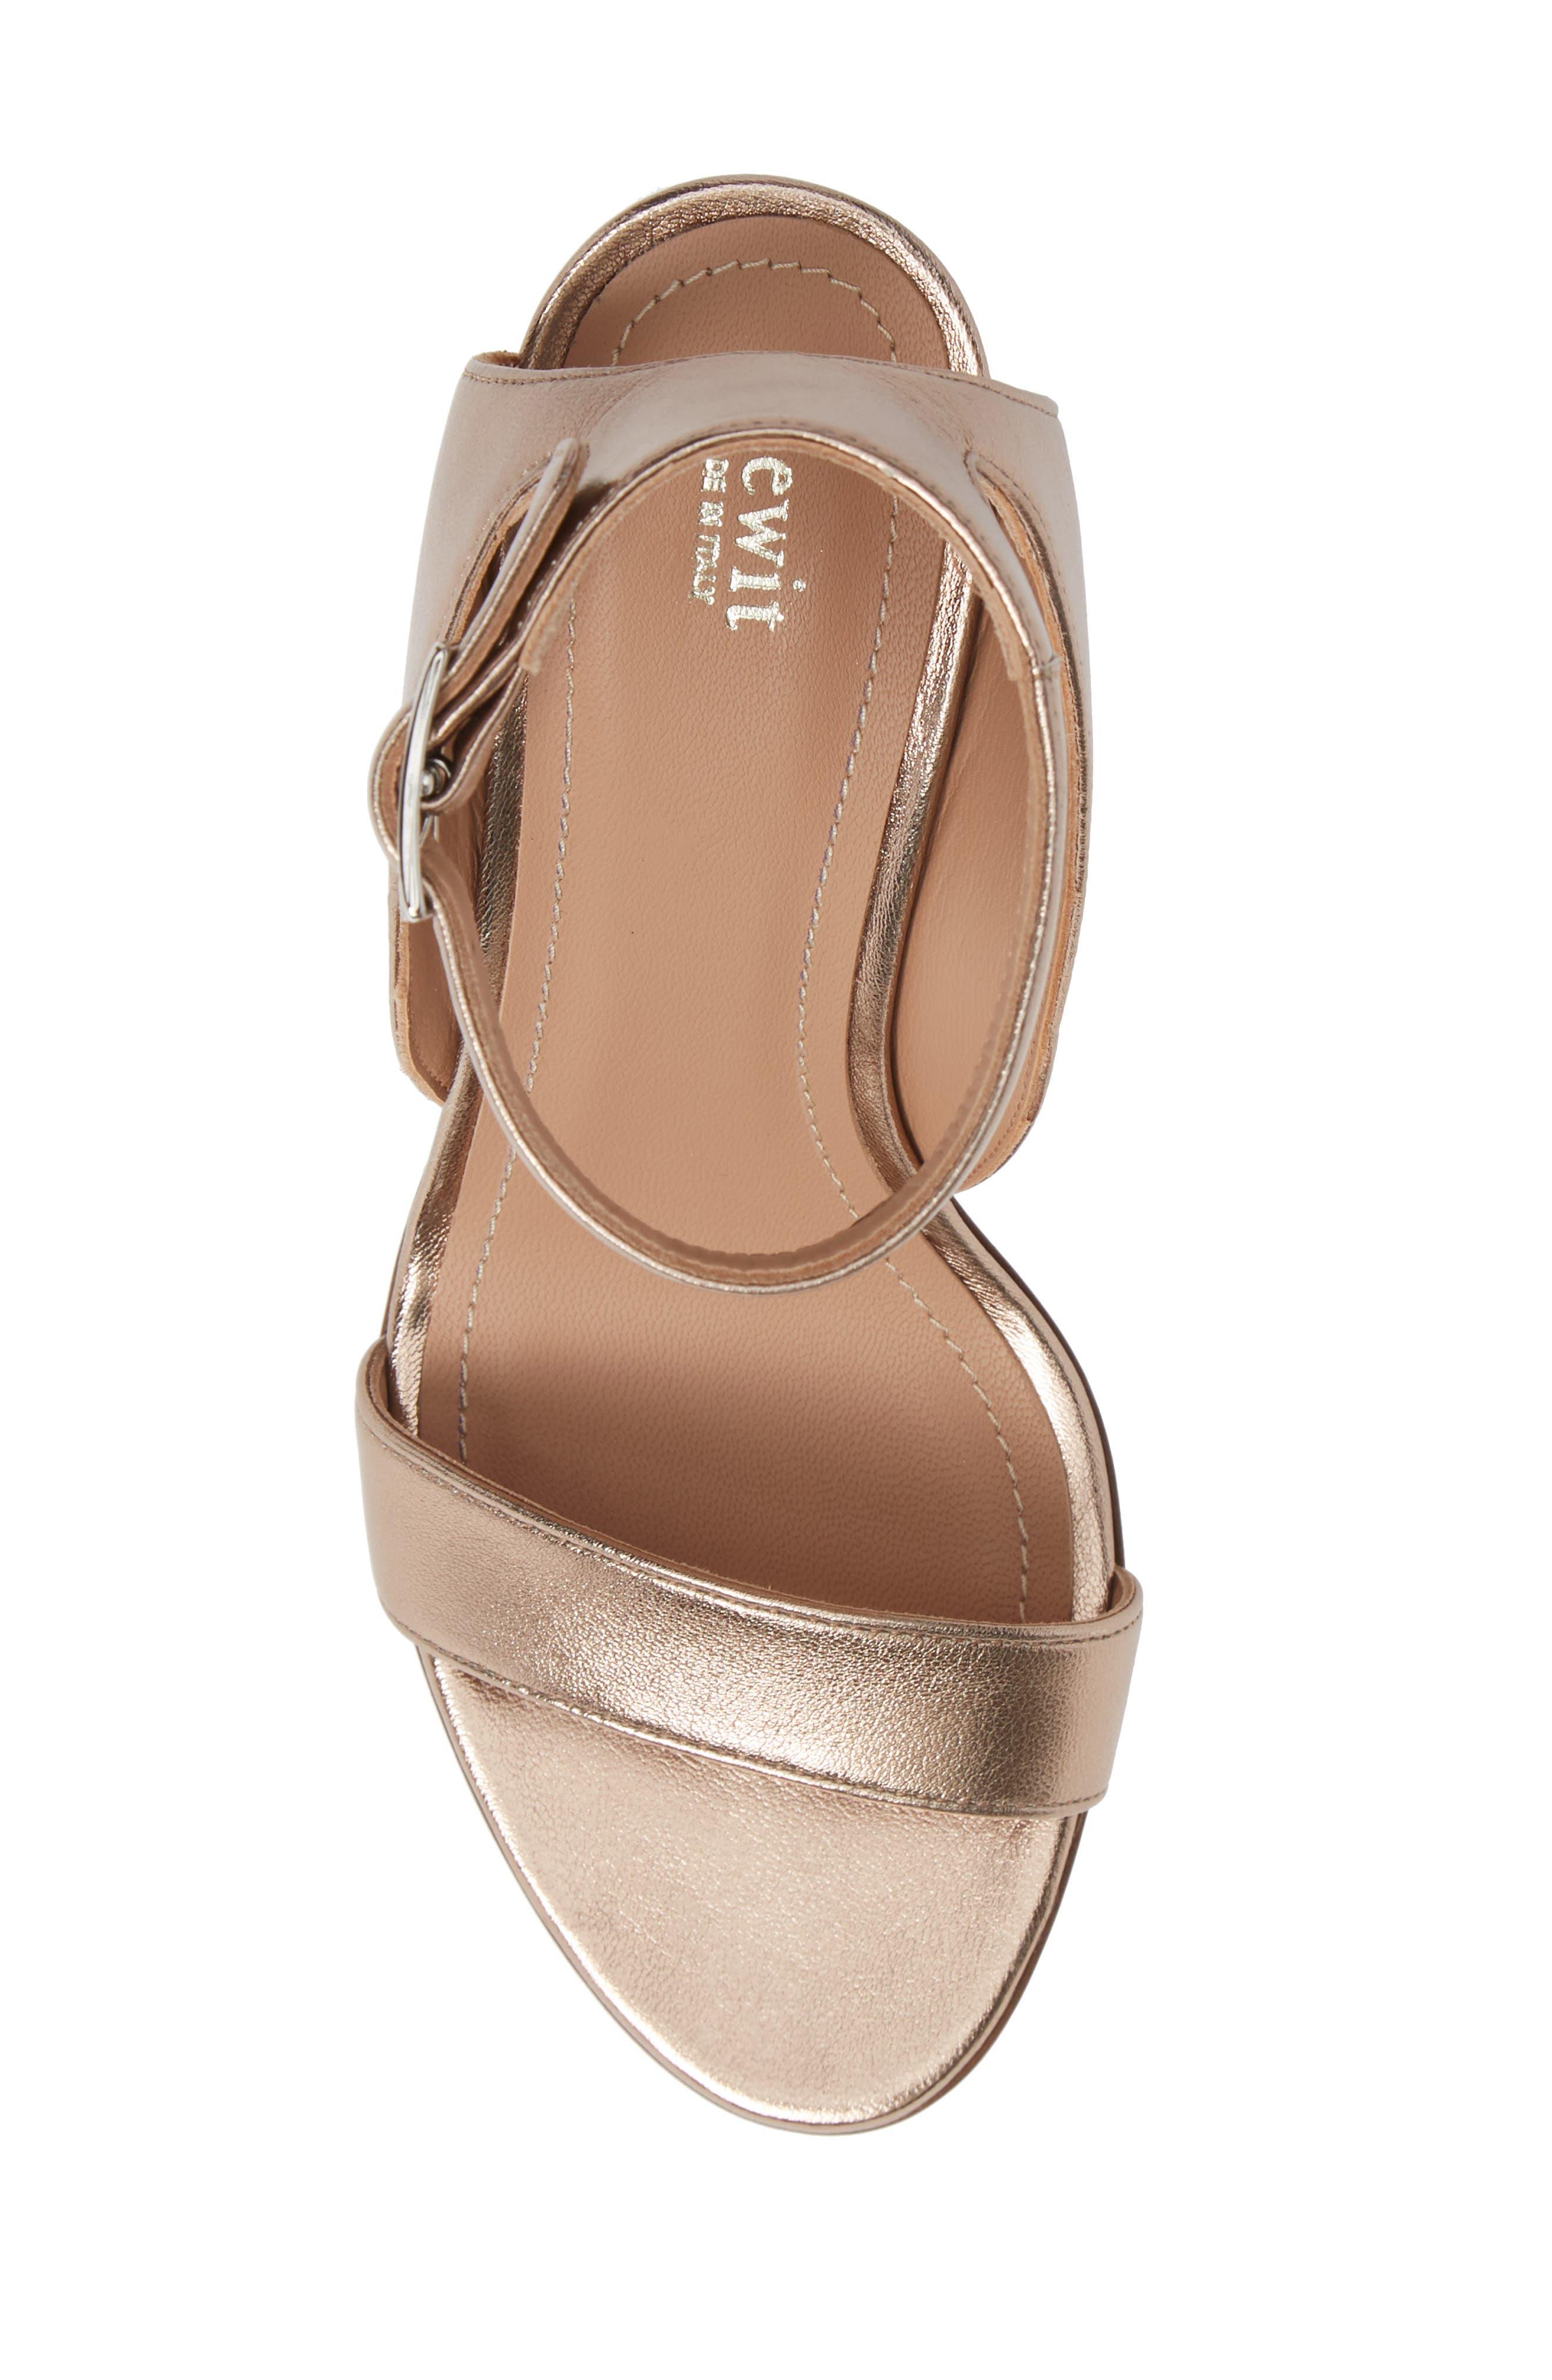 Guilia Block Heel Sandal,                             Alternate thumbnail 5, color,                             BRONZE LEATHER